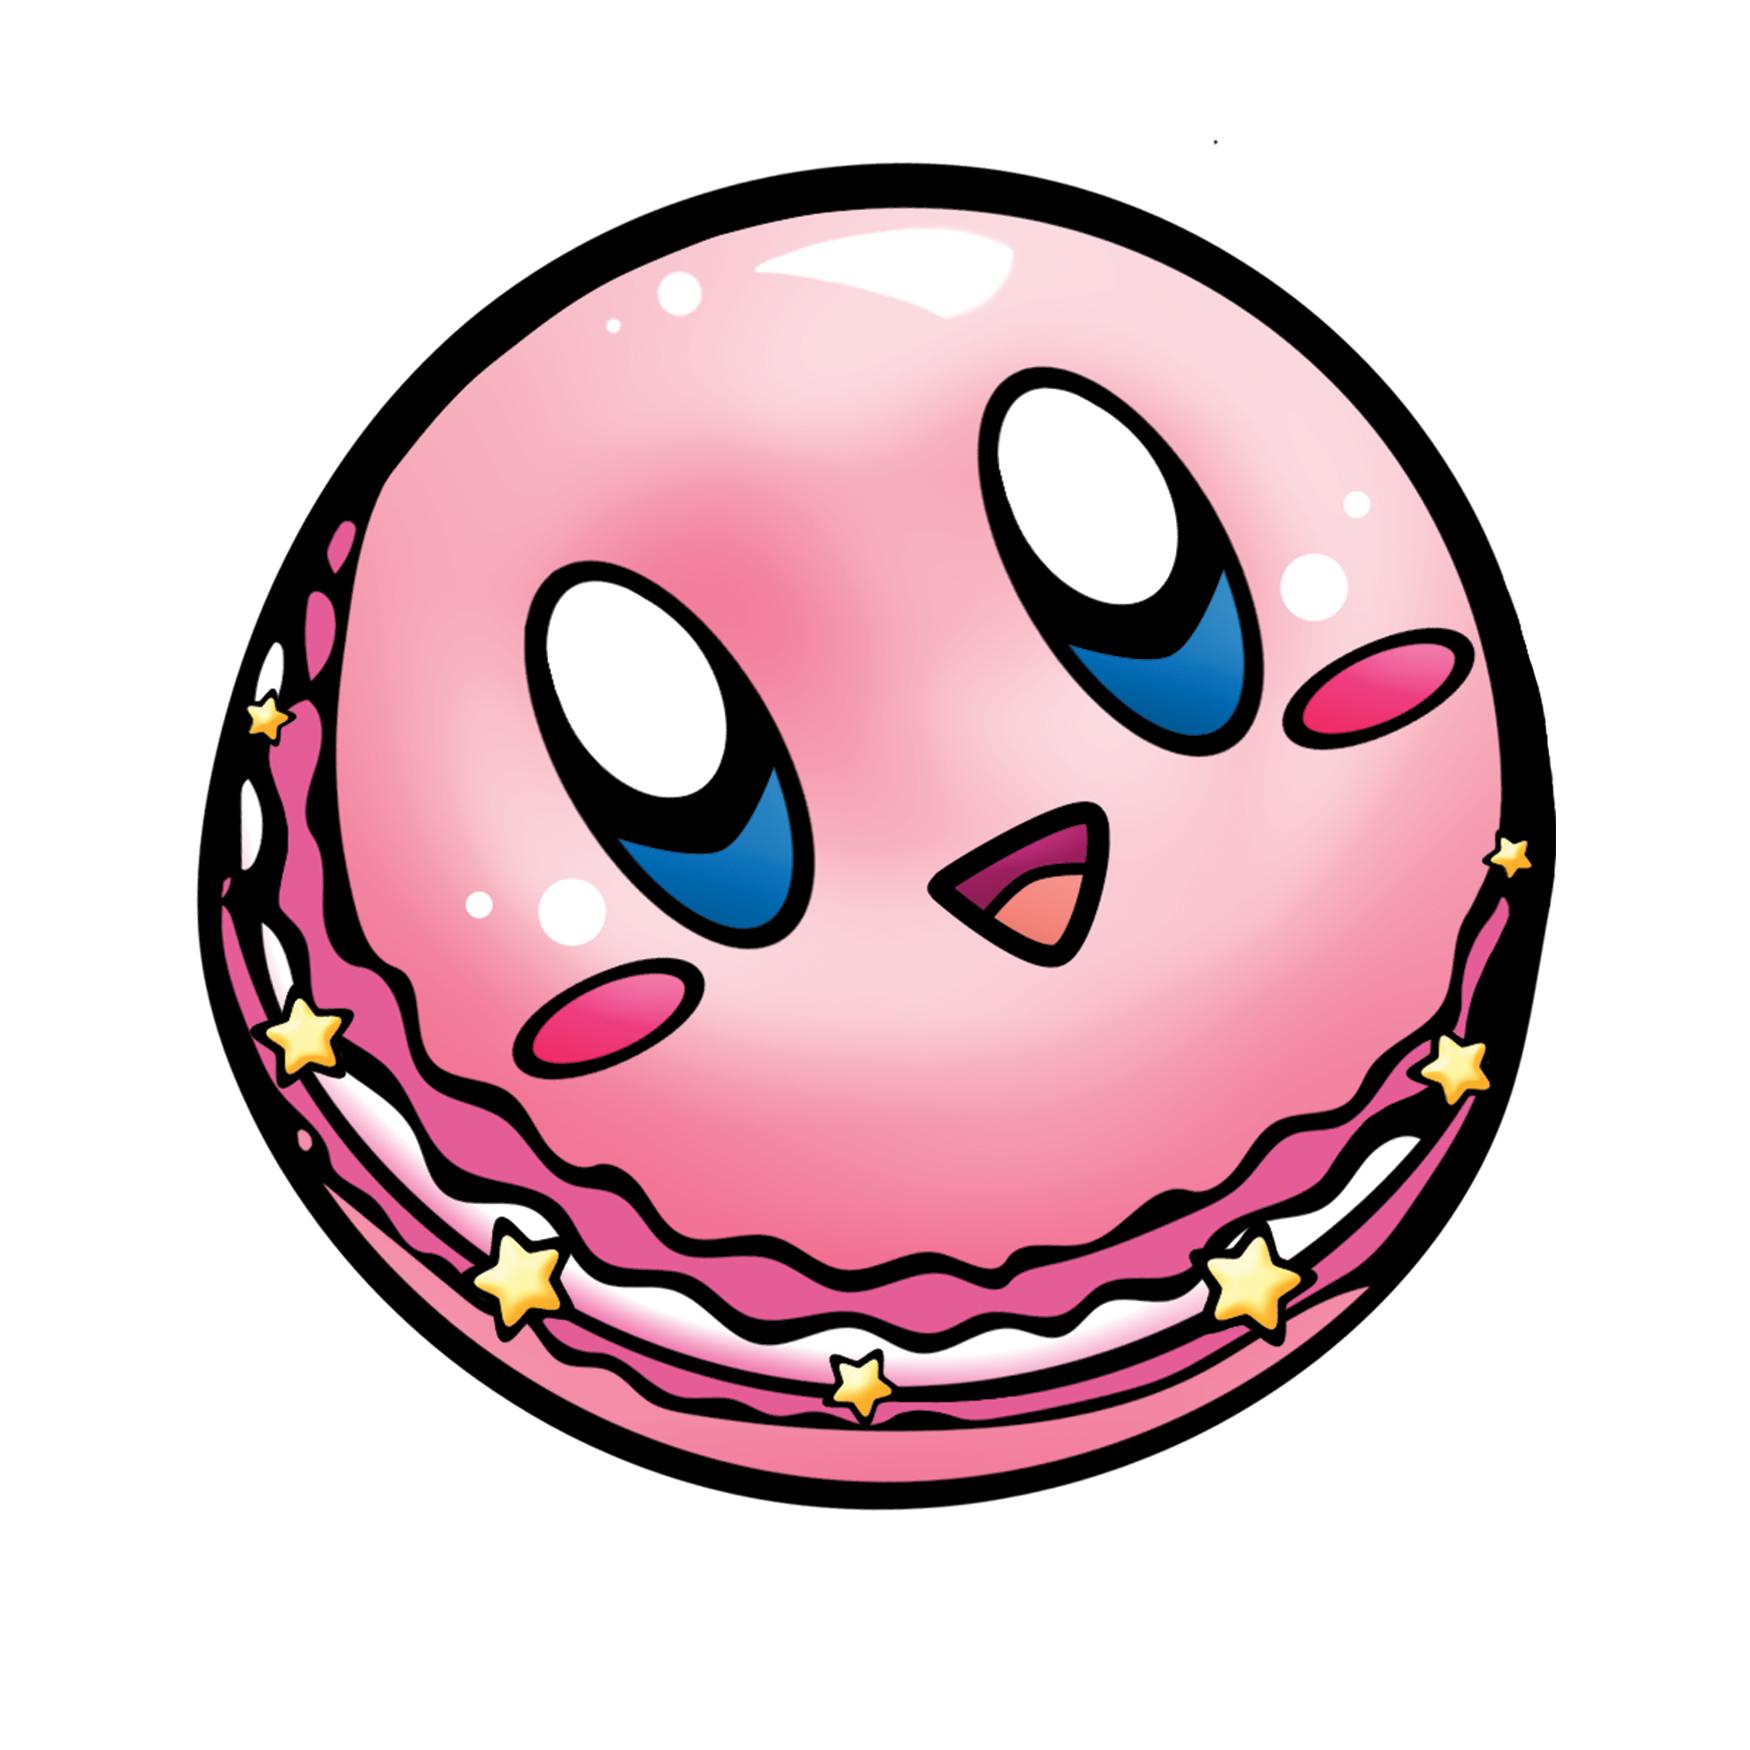 Kirby Macaron Vinyl Sticker - 3